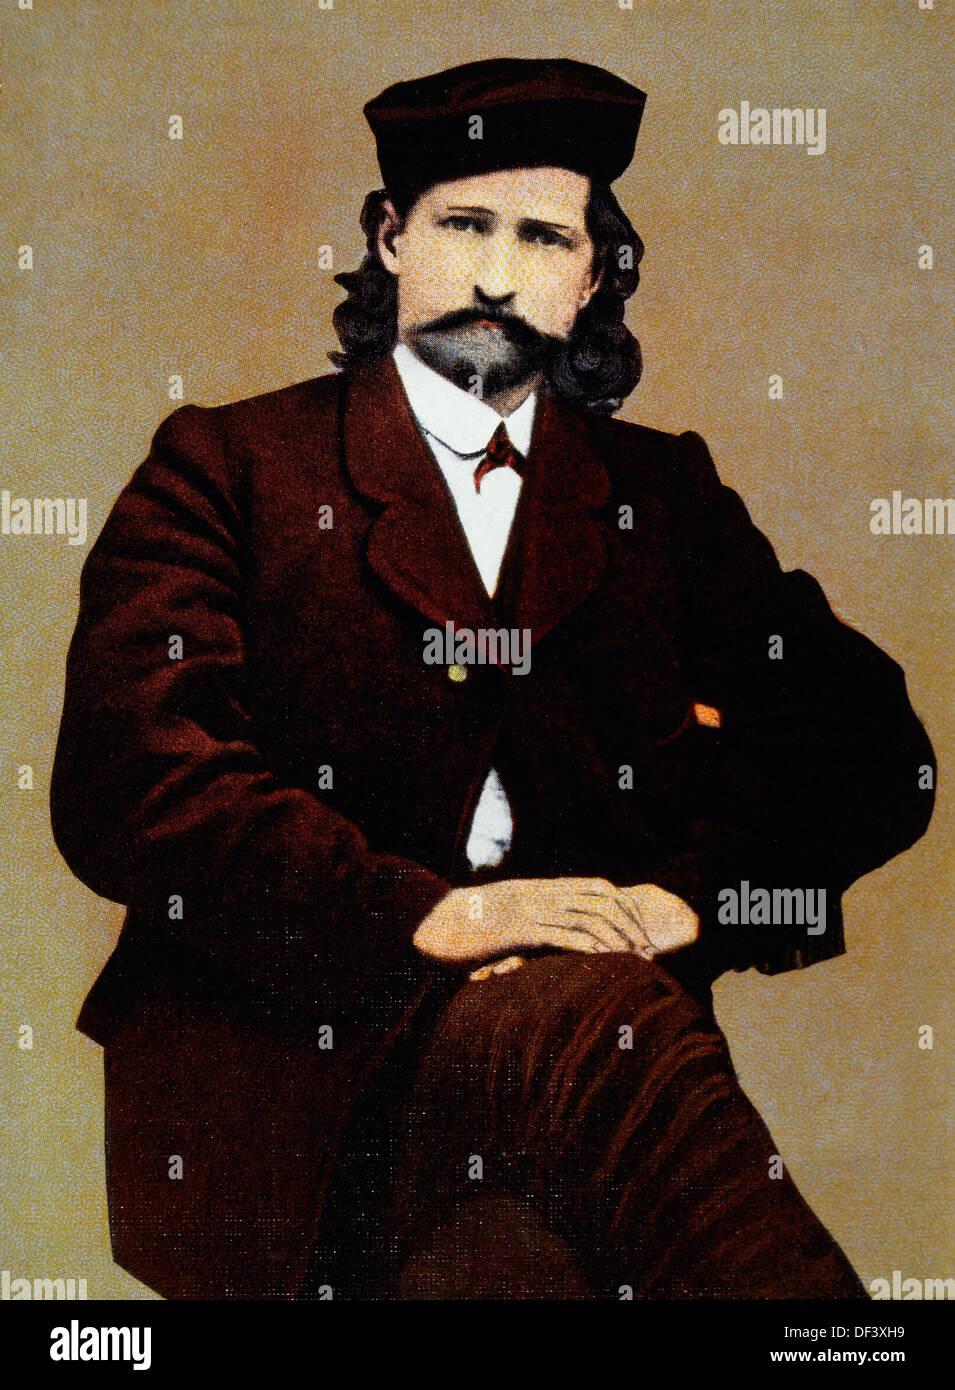 James Butler 'Wild Bill' Hickok (1837-1876), Portrait, Hand-Colored Photograph, 1873 - Stock Image